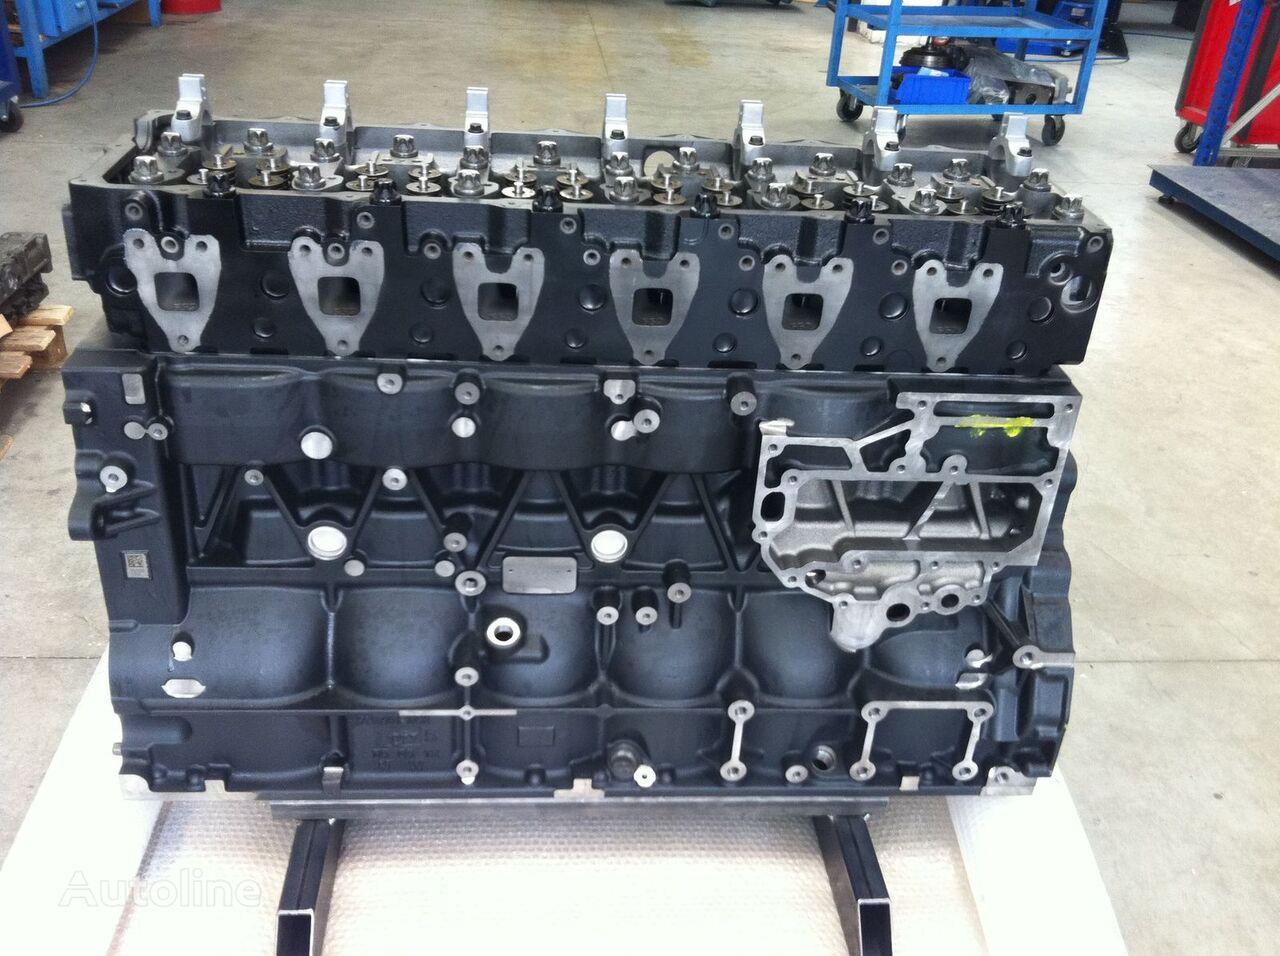 MAN - MOTORE D2676LE126 - INDUSTRIALE / STAZIONARIO e cylinder block for truck